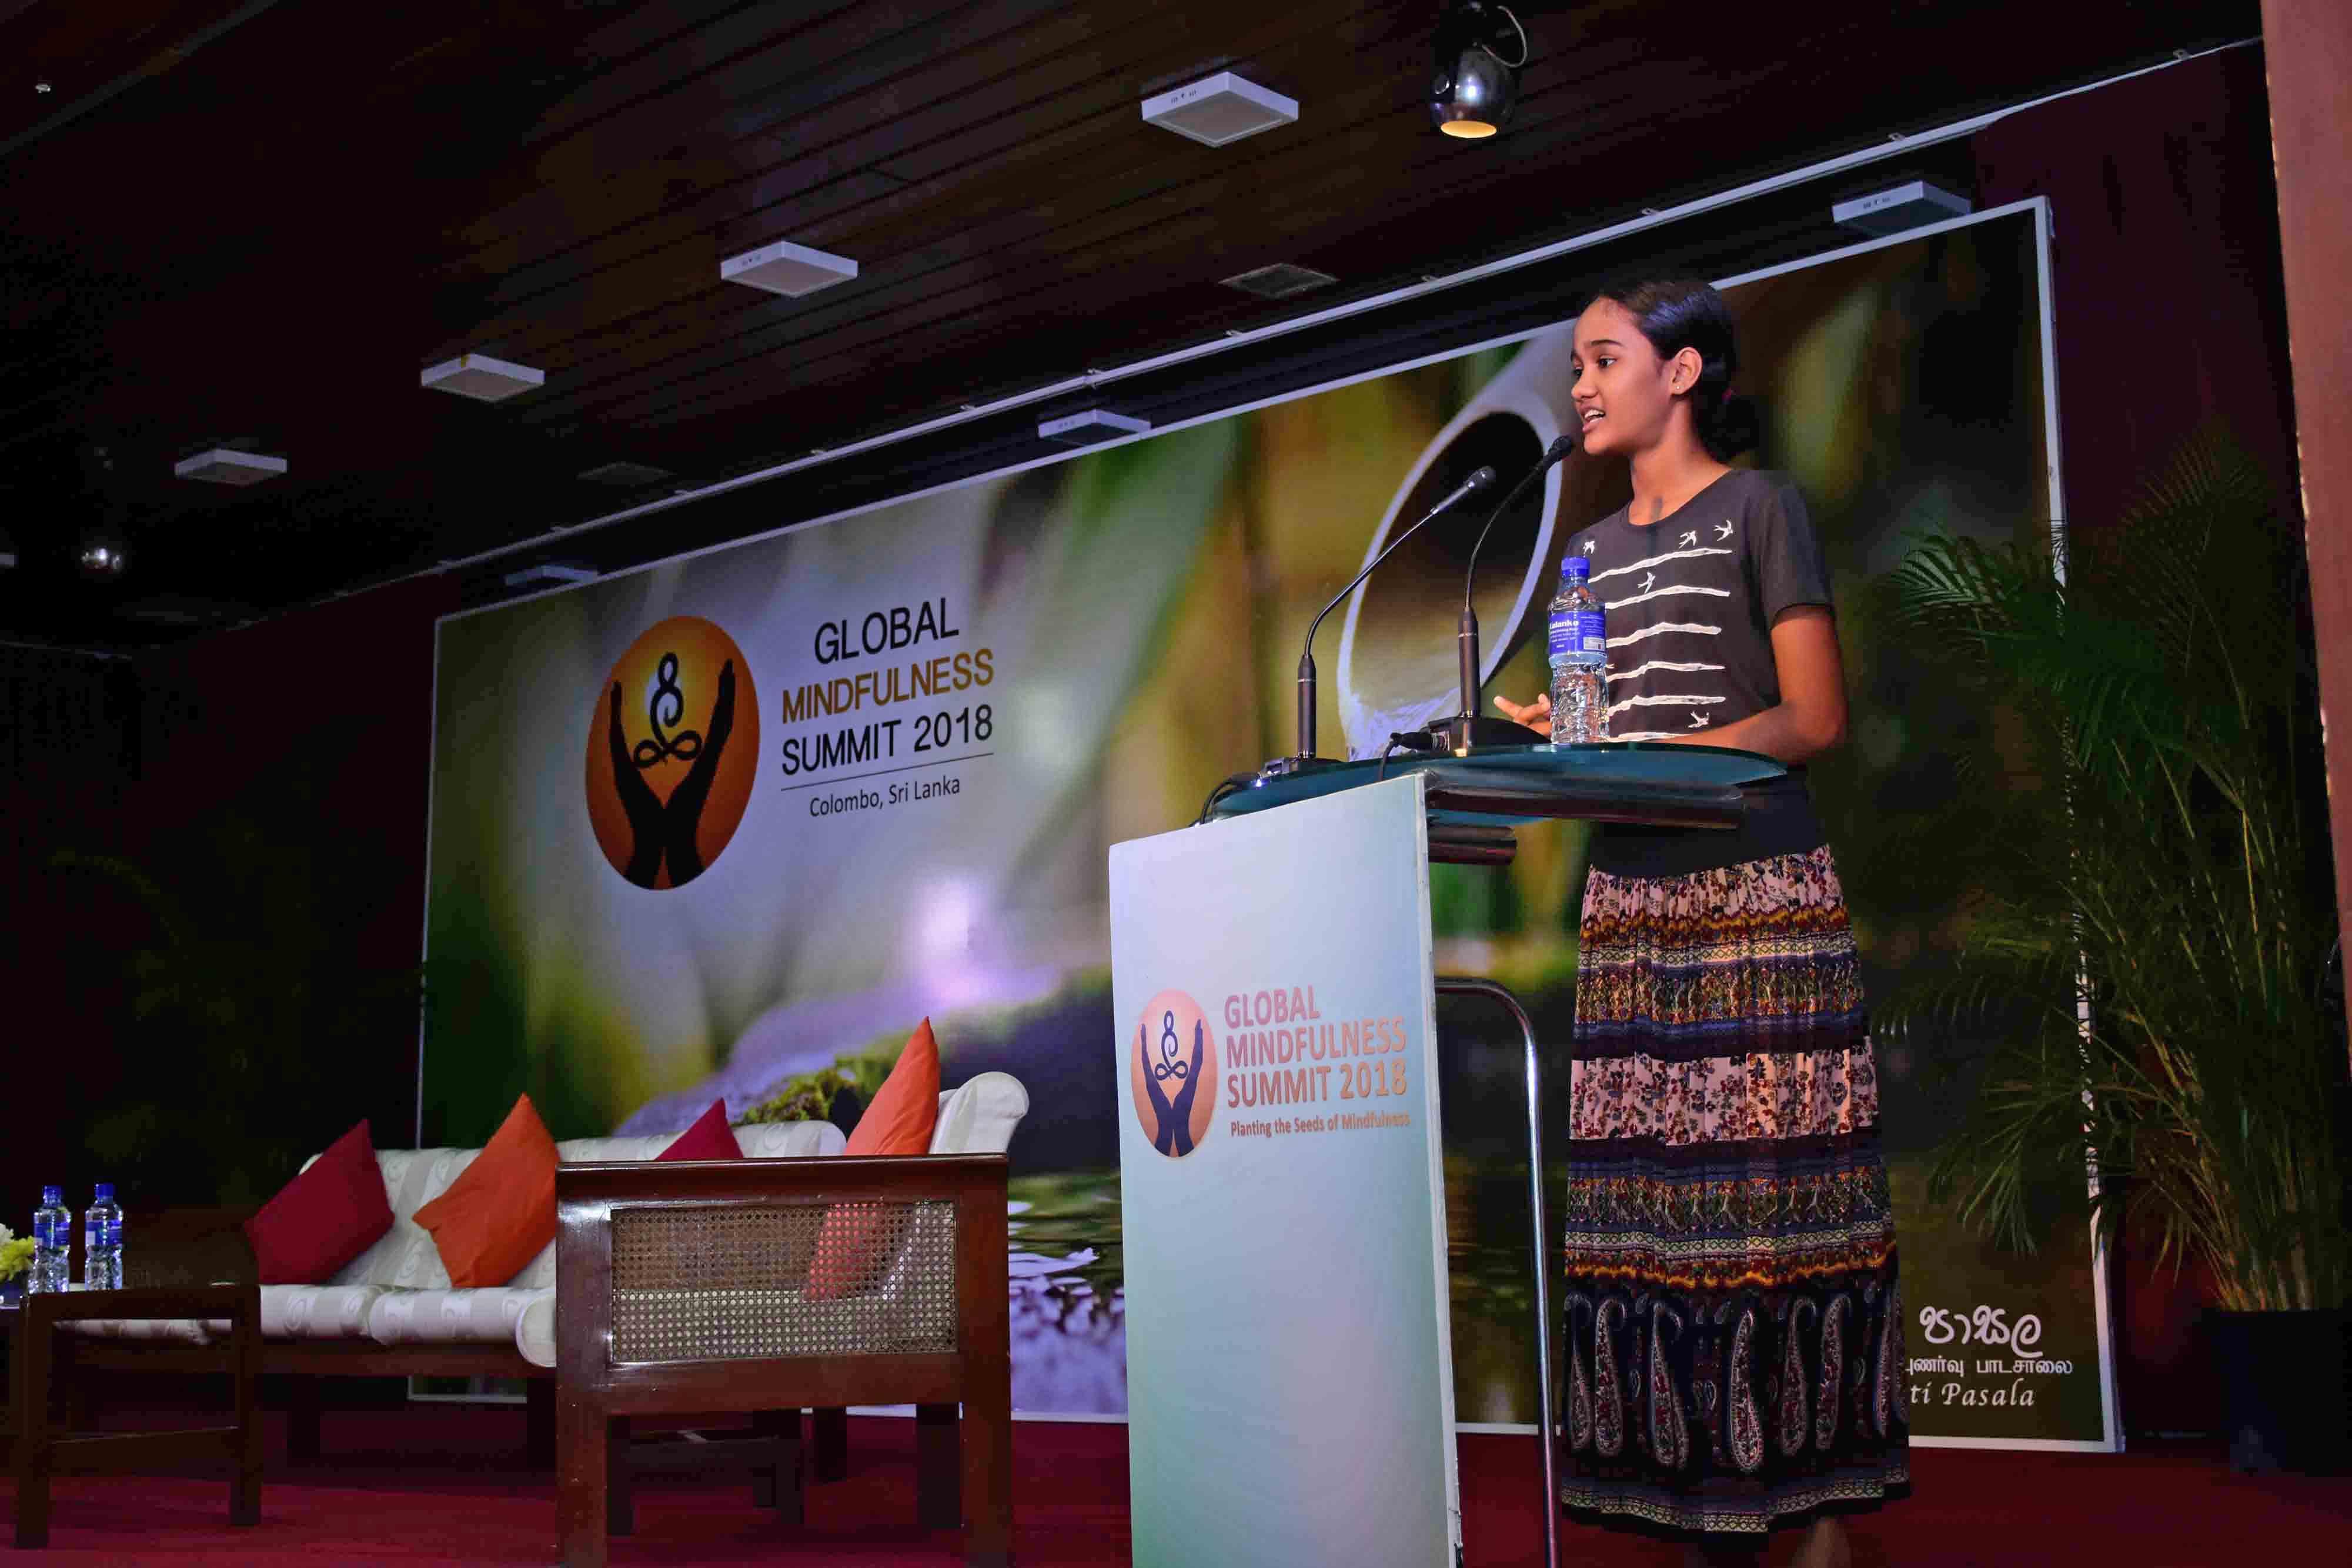 Global Mindfulness Summit 2018 - Day2 (7)